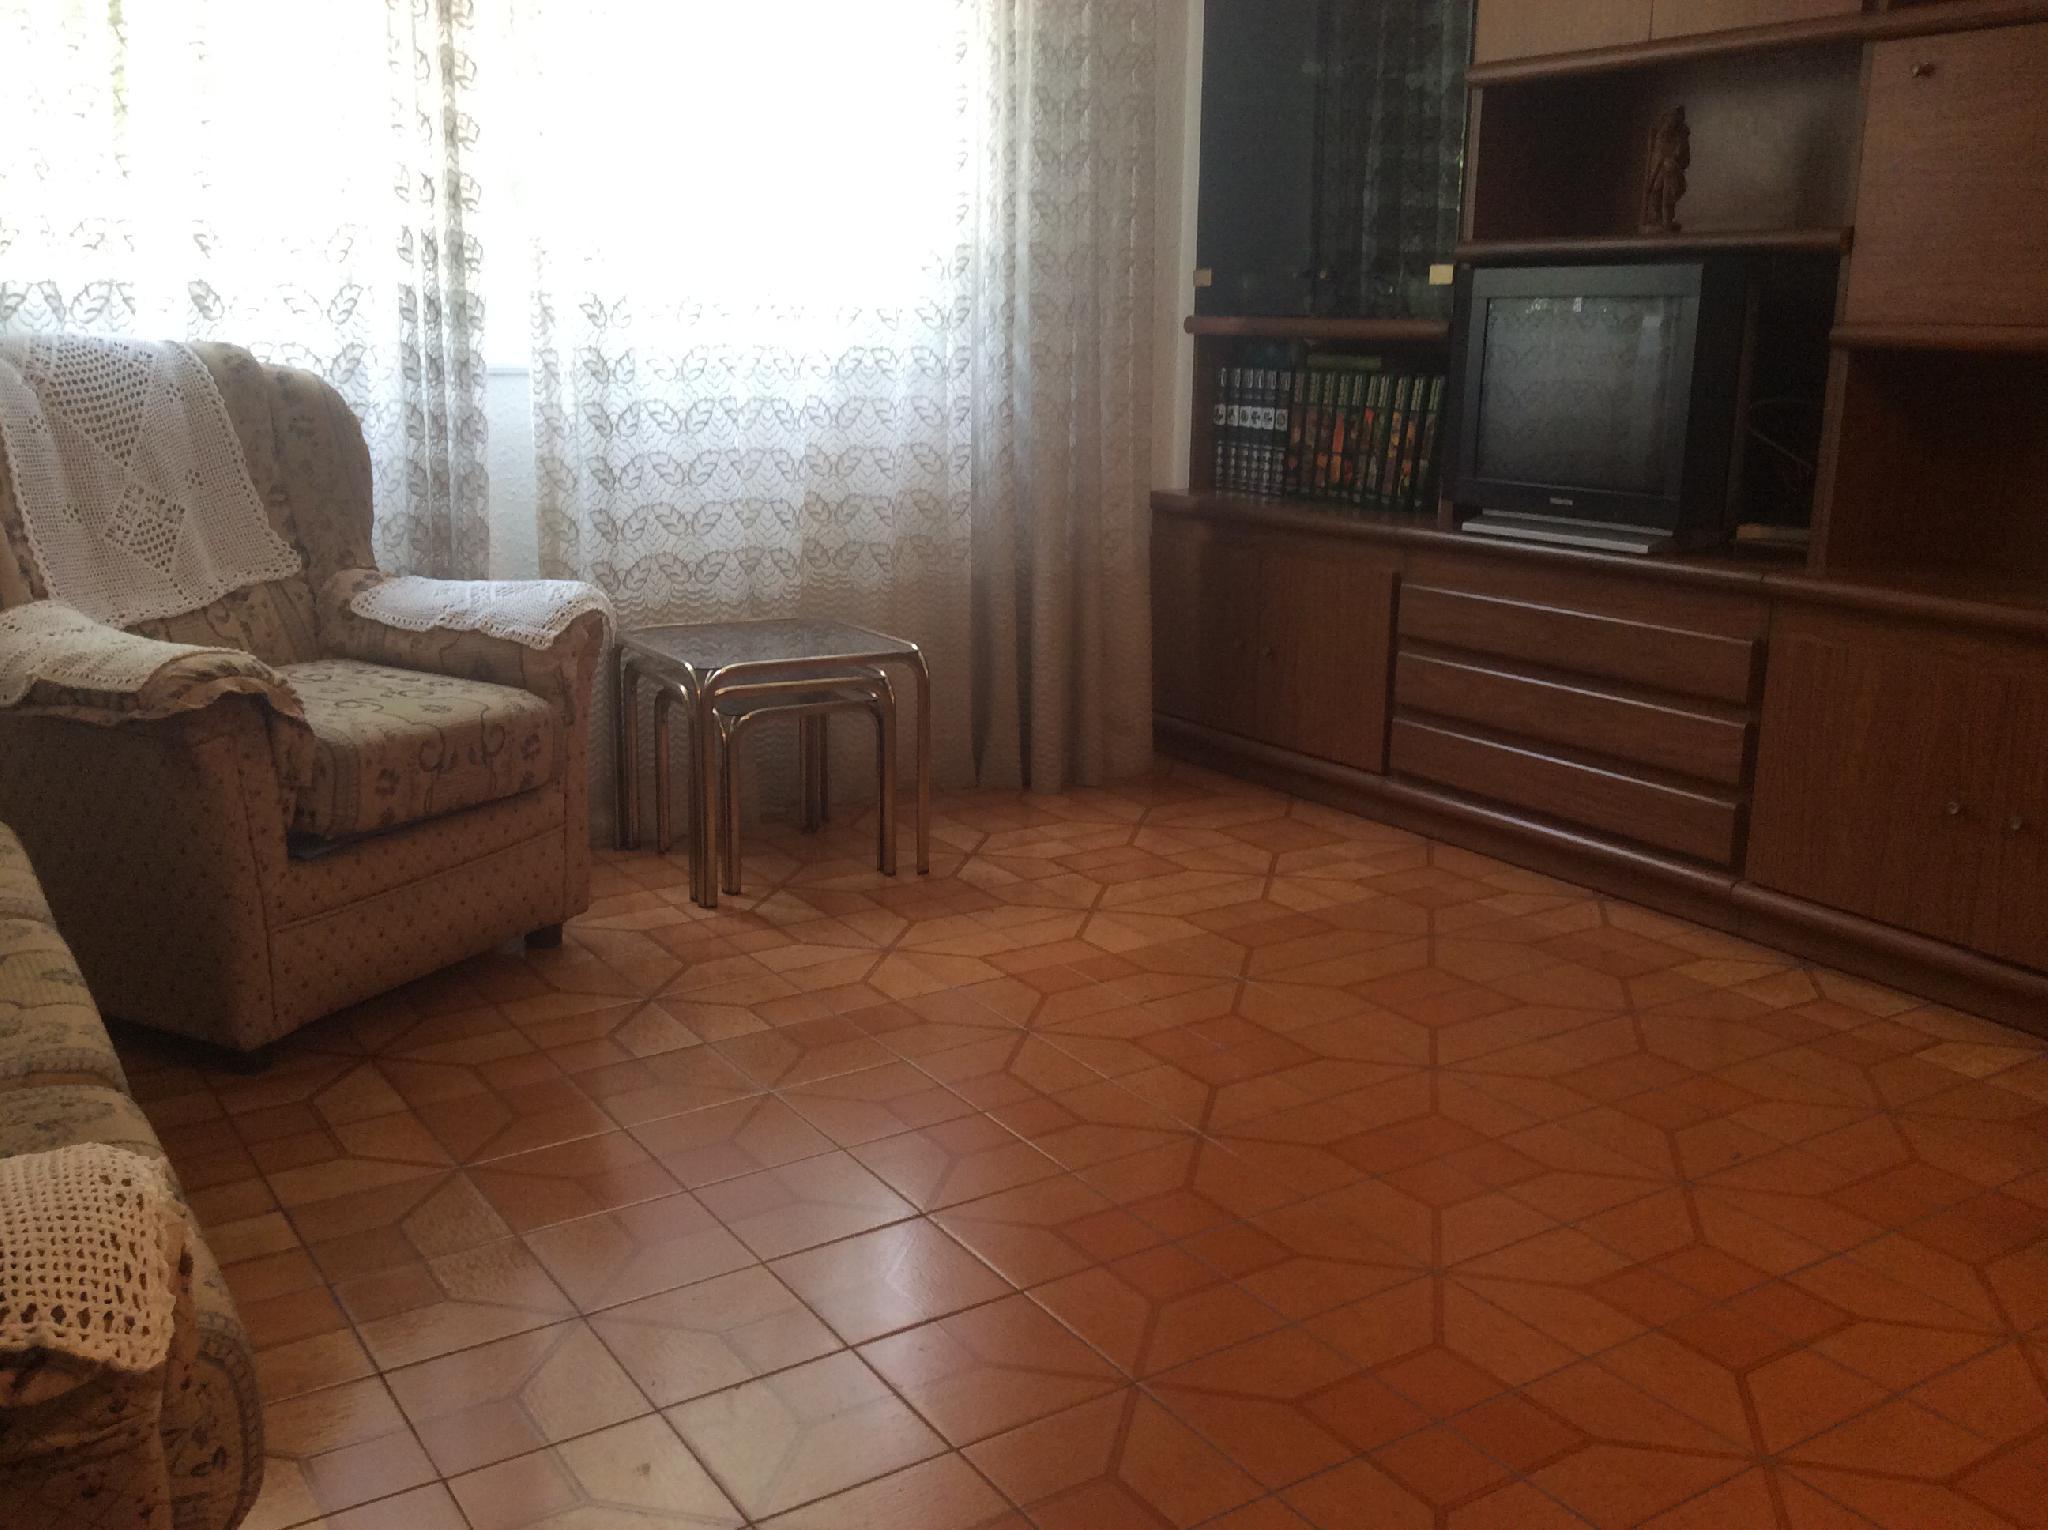 flat-for-sale-in-maresme-guipuscua-la-verneda-i-la-pau-in-barcelona